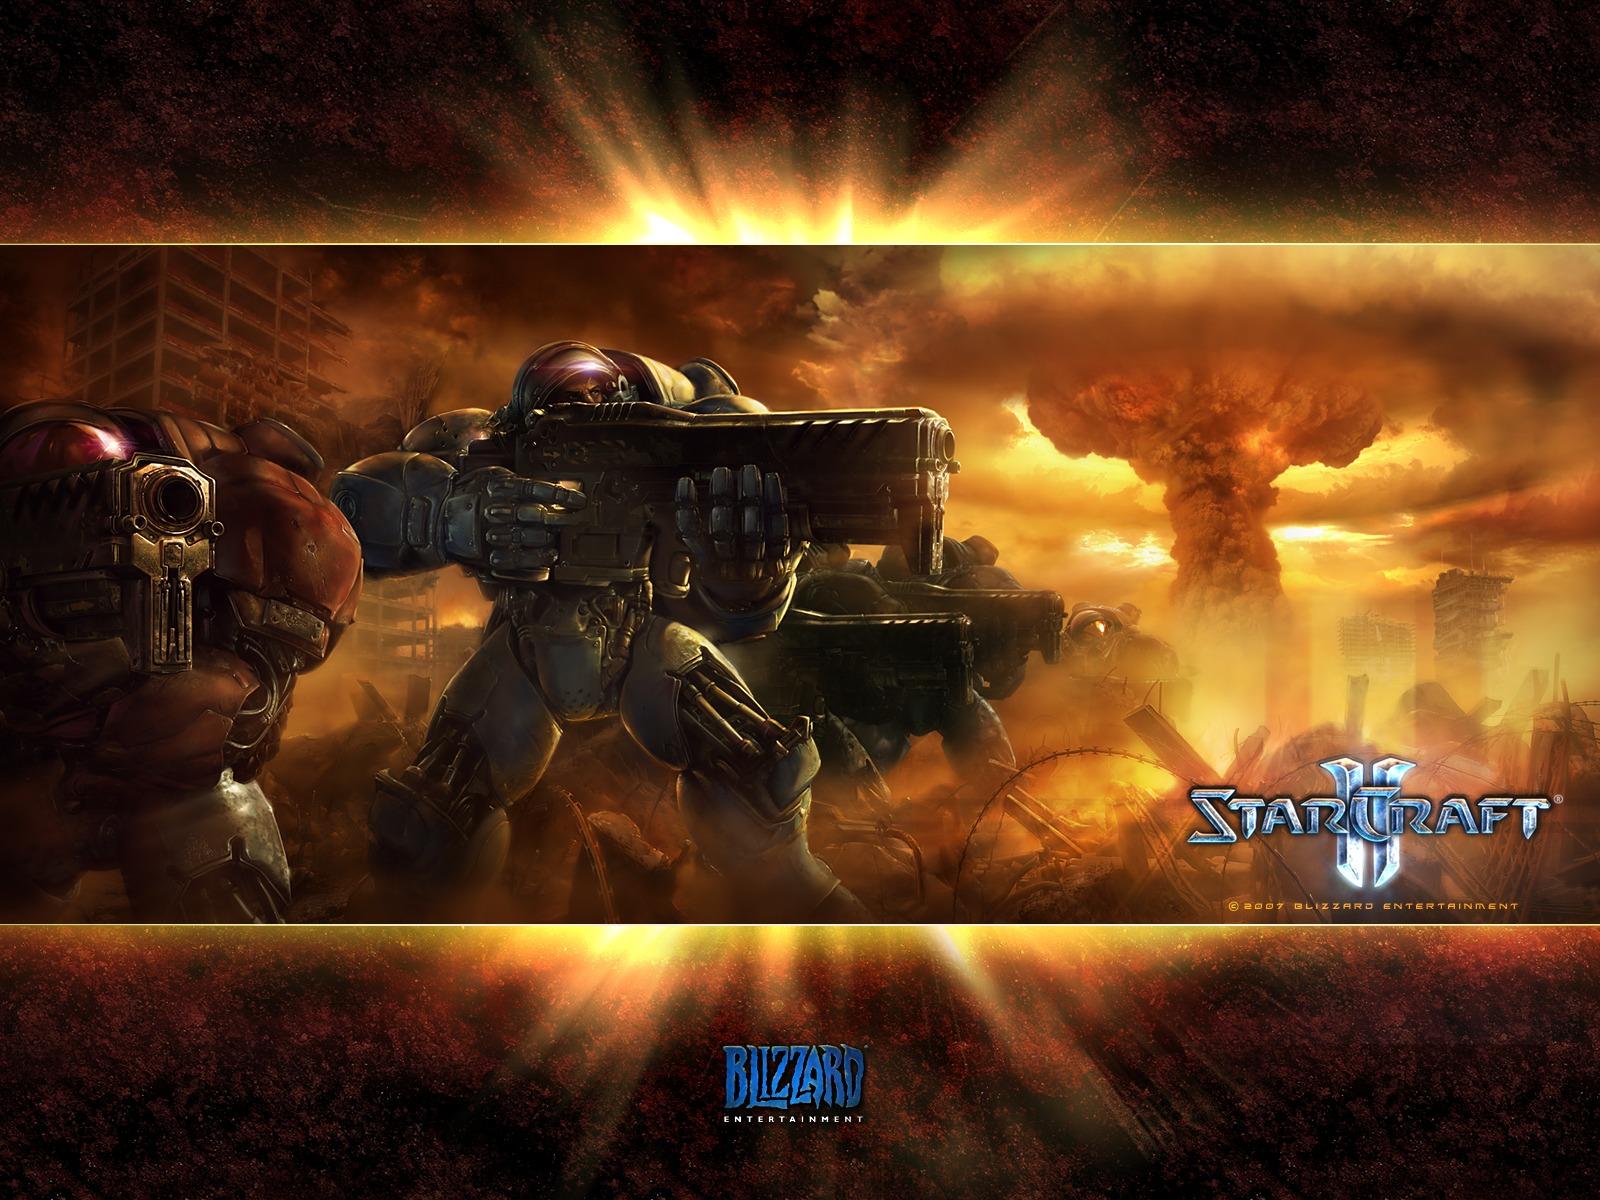 StarCraft 2 Nuke Wallpaper 1600x1200